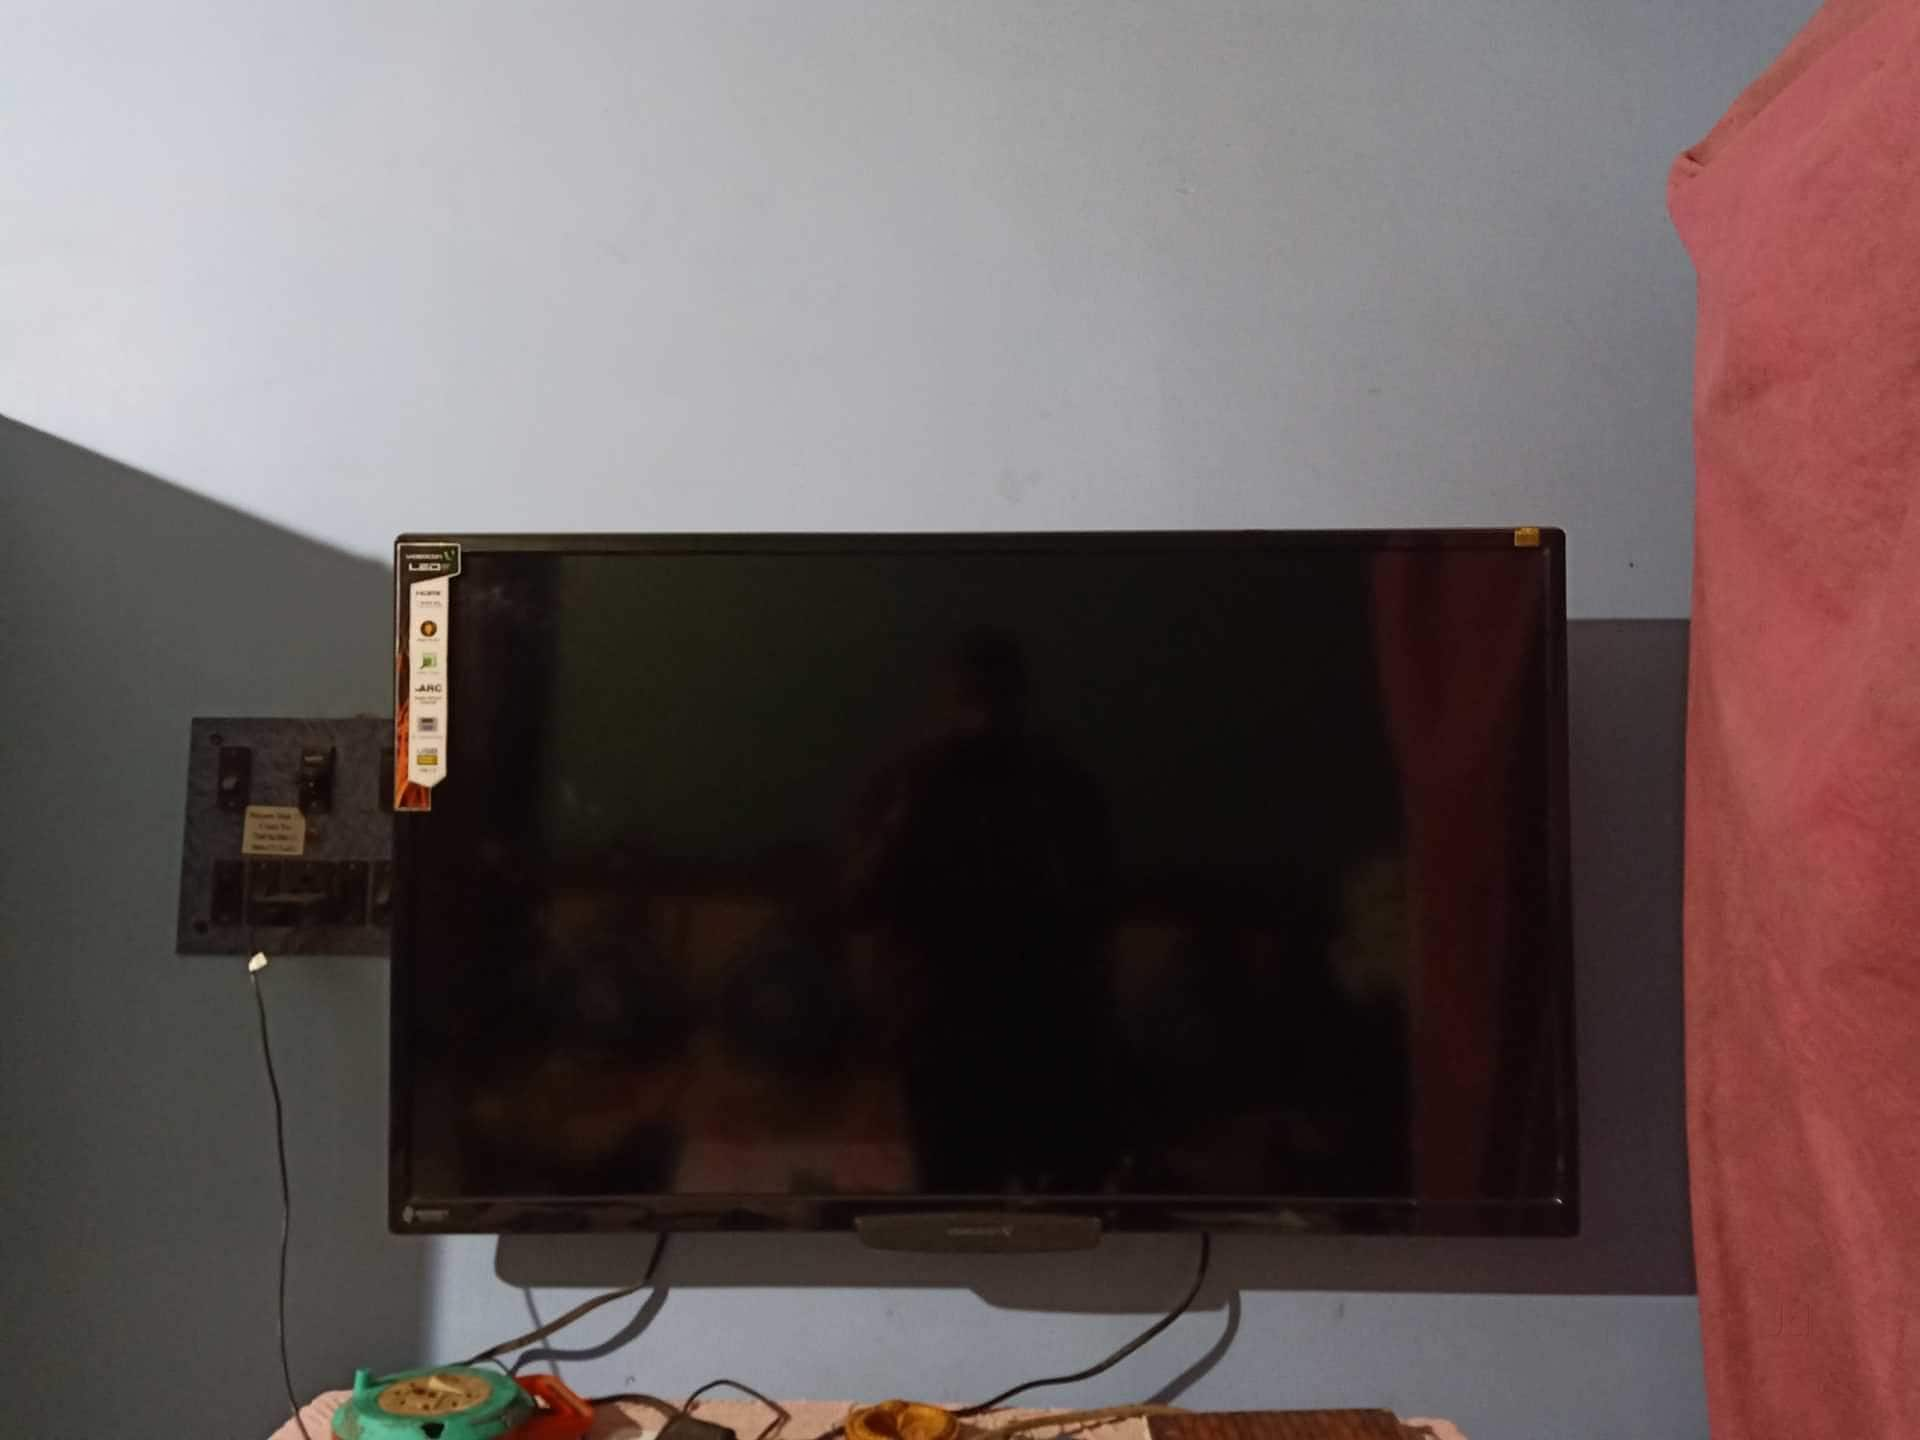 Top 100 Sony Led Tv Repair & Services in Kolkata - Best Sony Led Tv